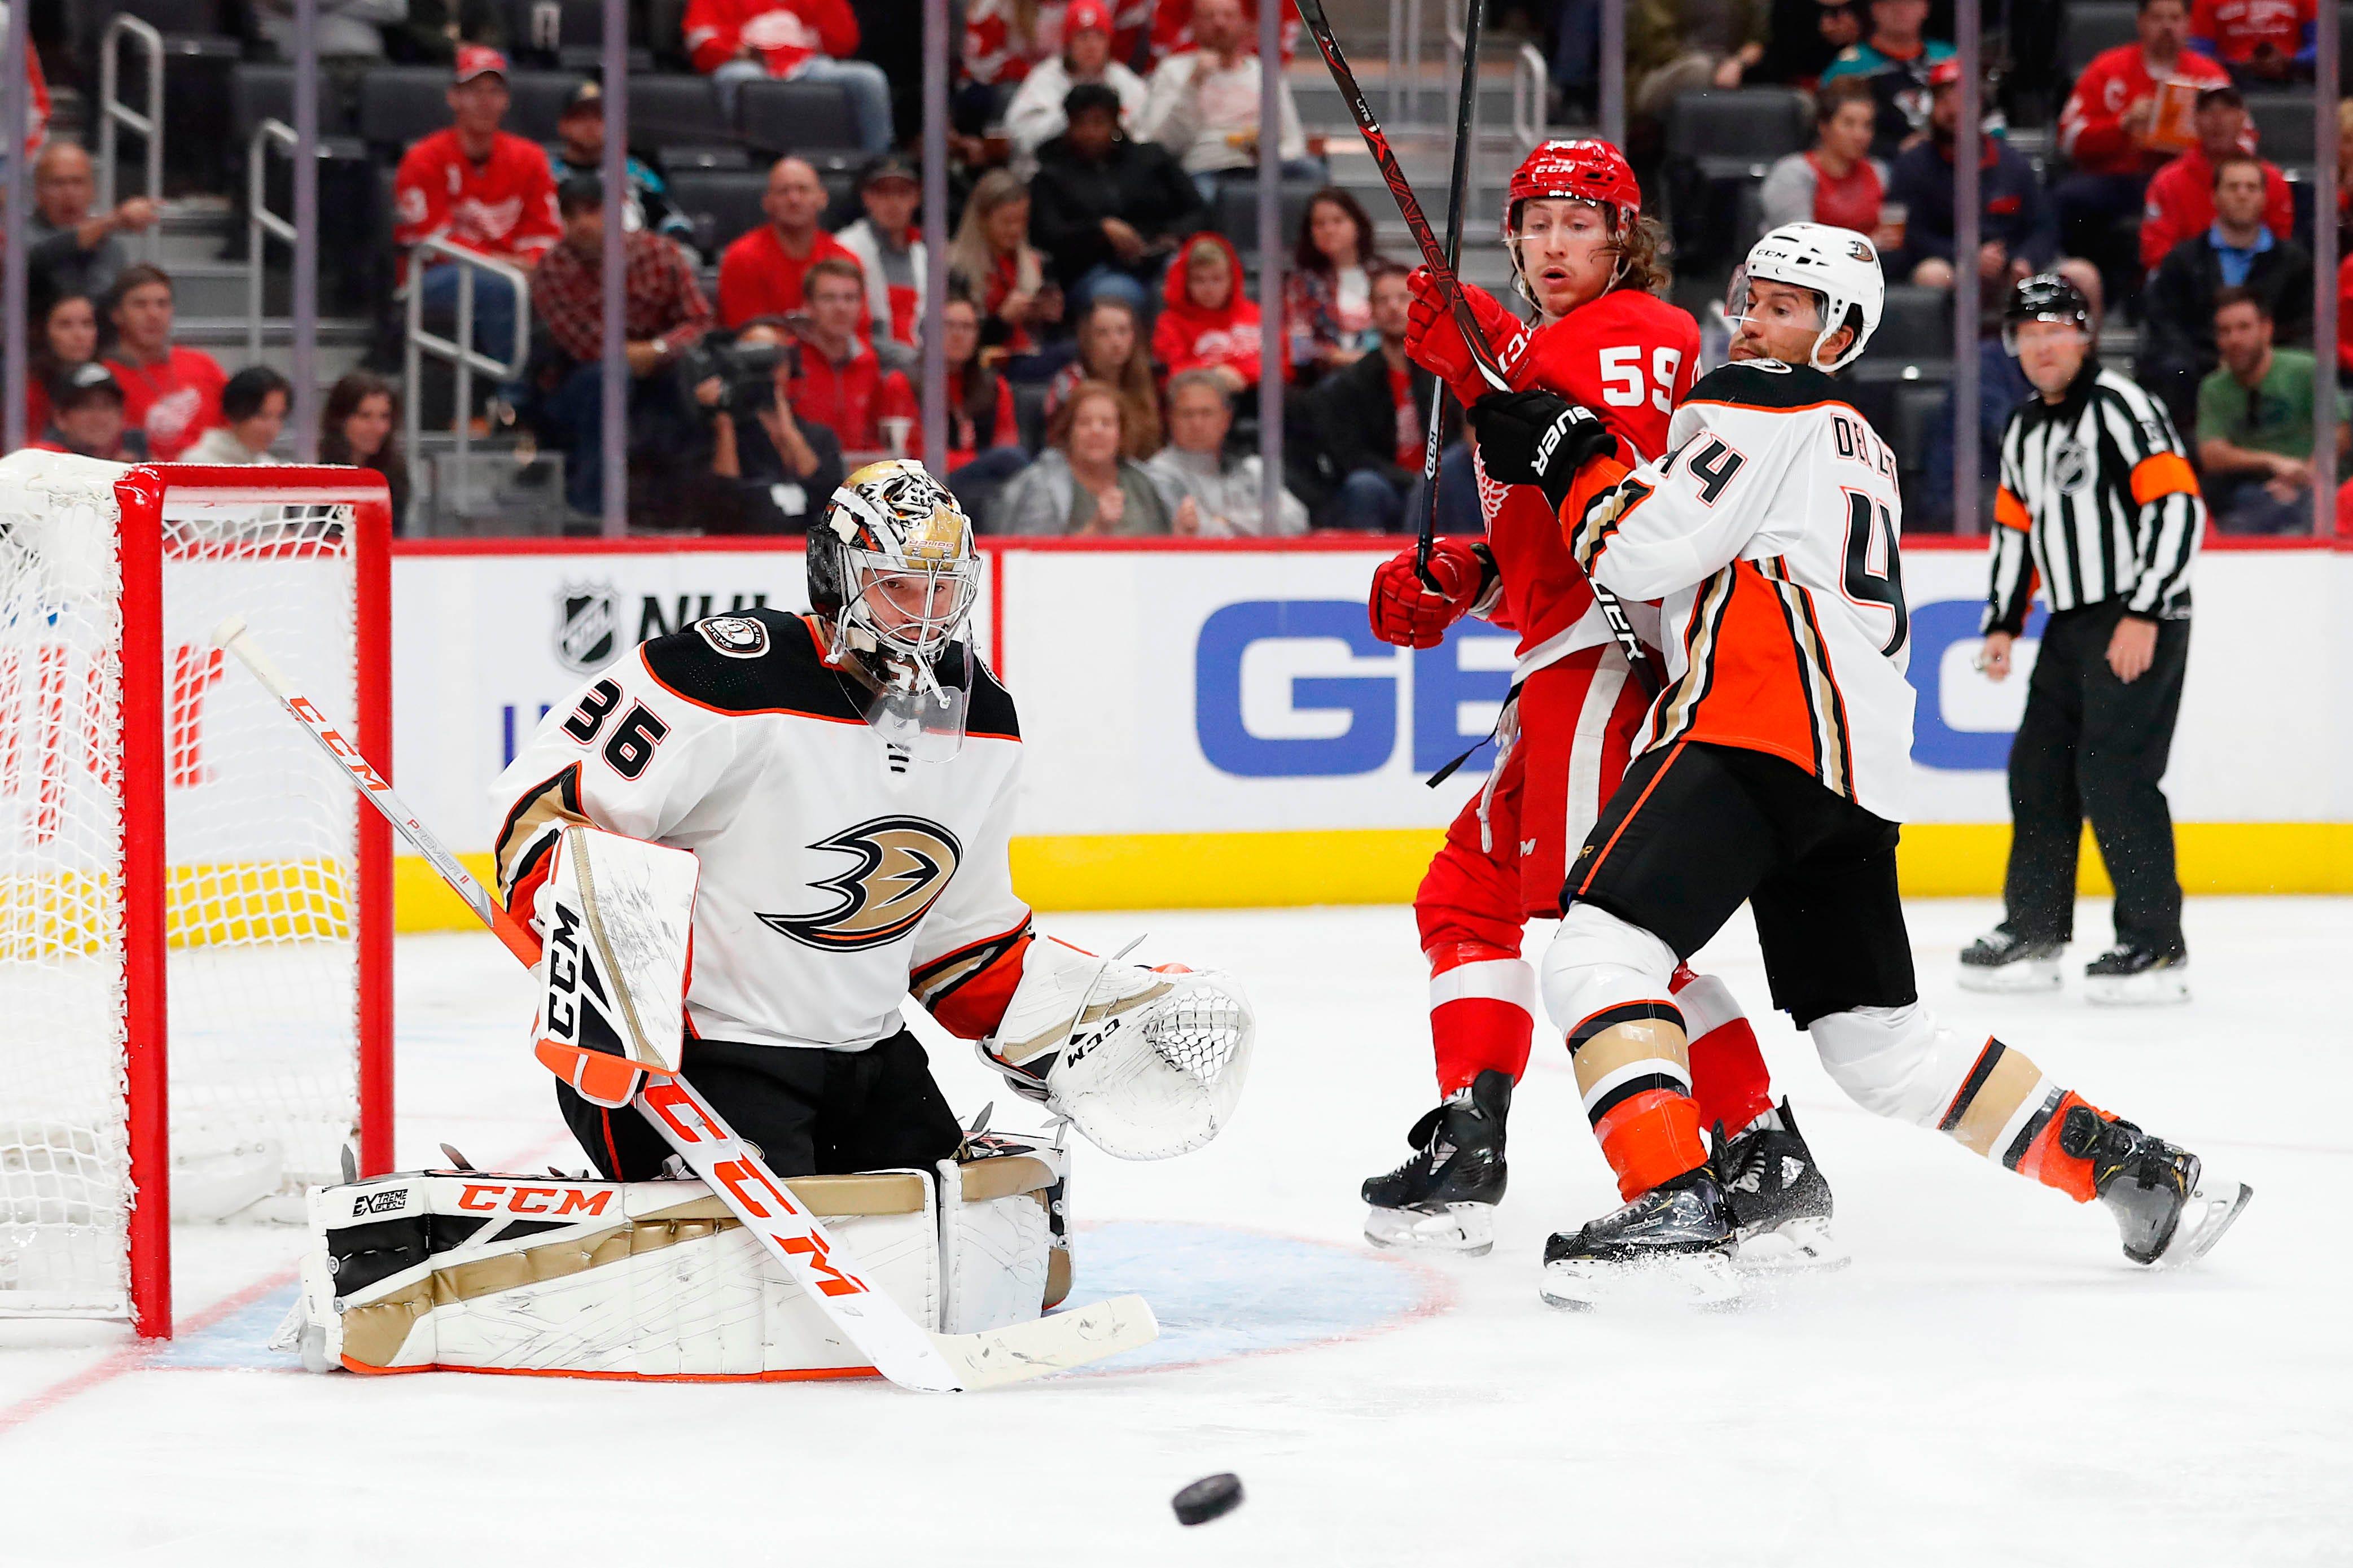 Anaheim Ducks, John Gibson among the NHL's early season surprises